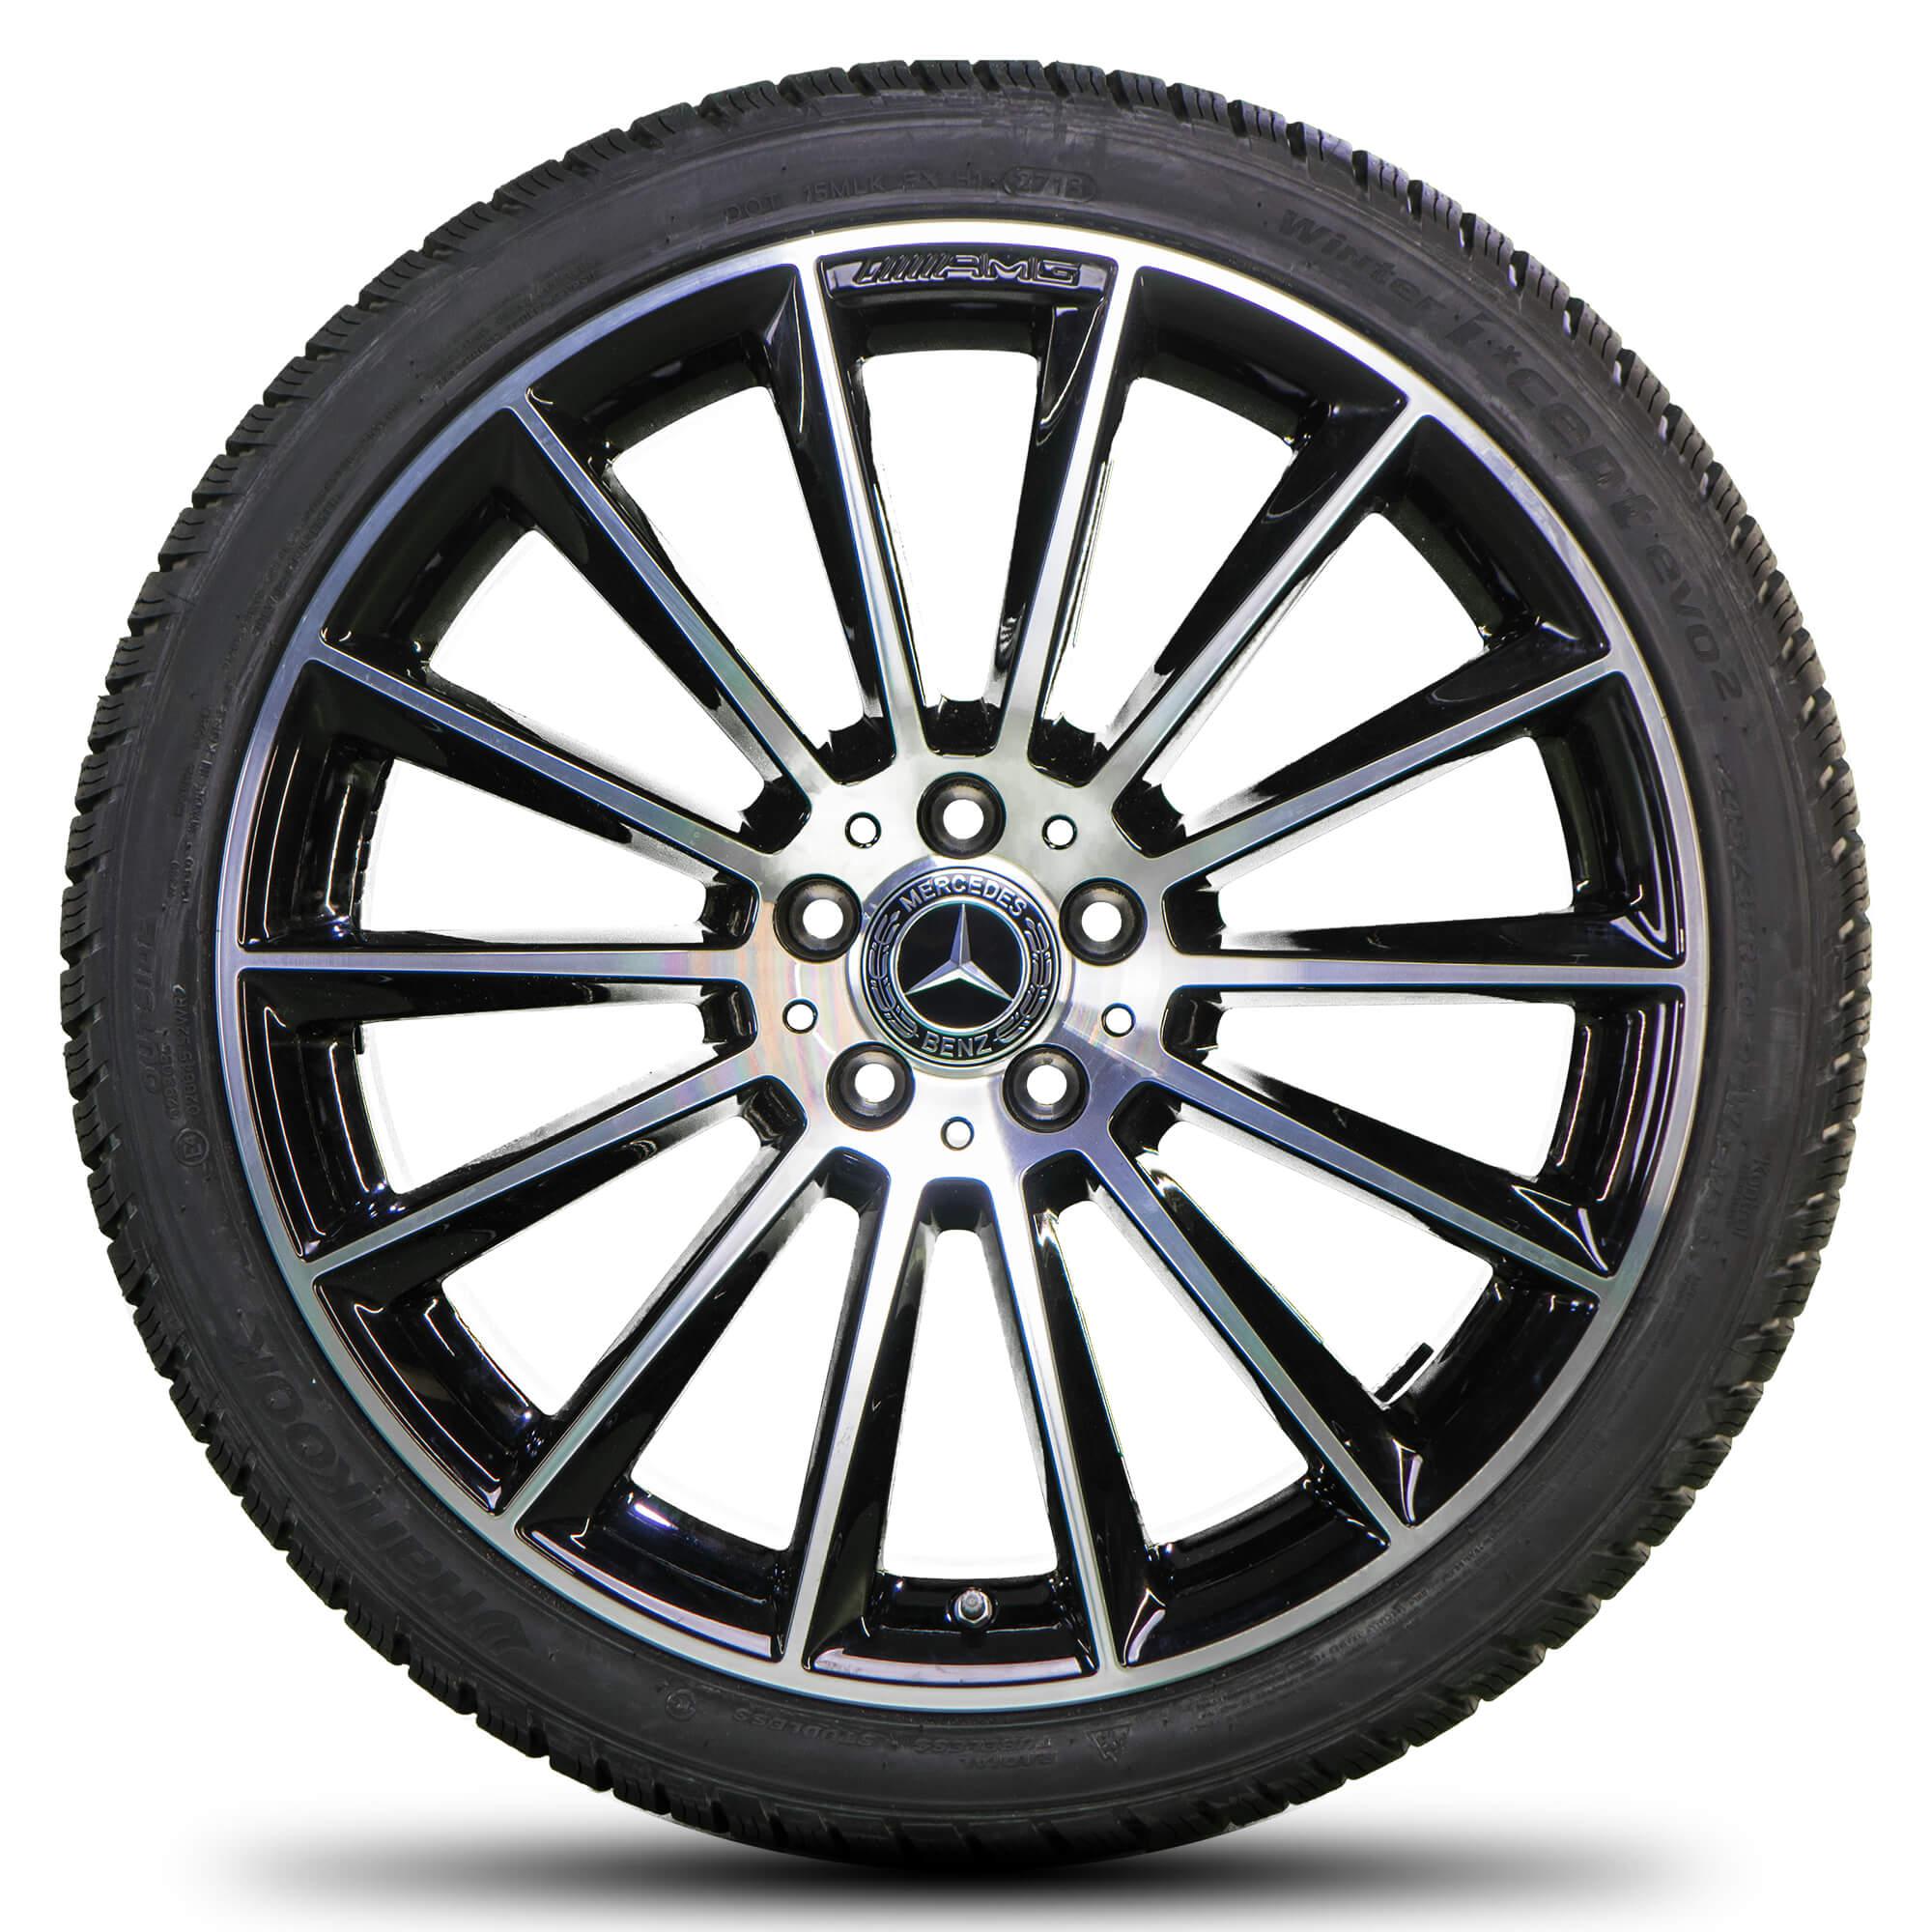 s alufelgen katalog de felge bmw 2 3er f30 f31 2013 20 Nardo Gray Audi R8 20027 vielspeichen rad amg 20 zoll mercedes e kla 2